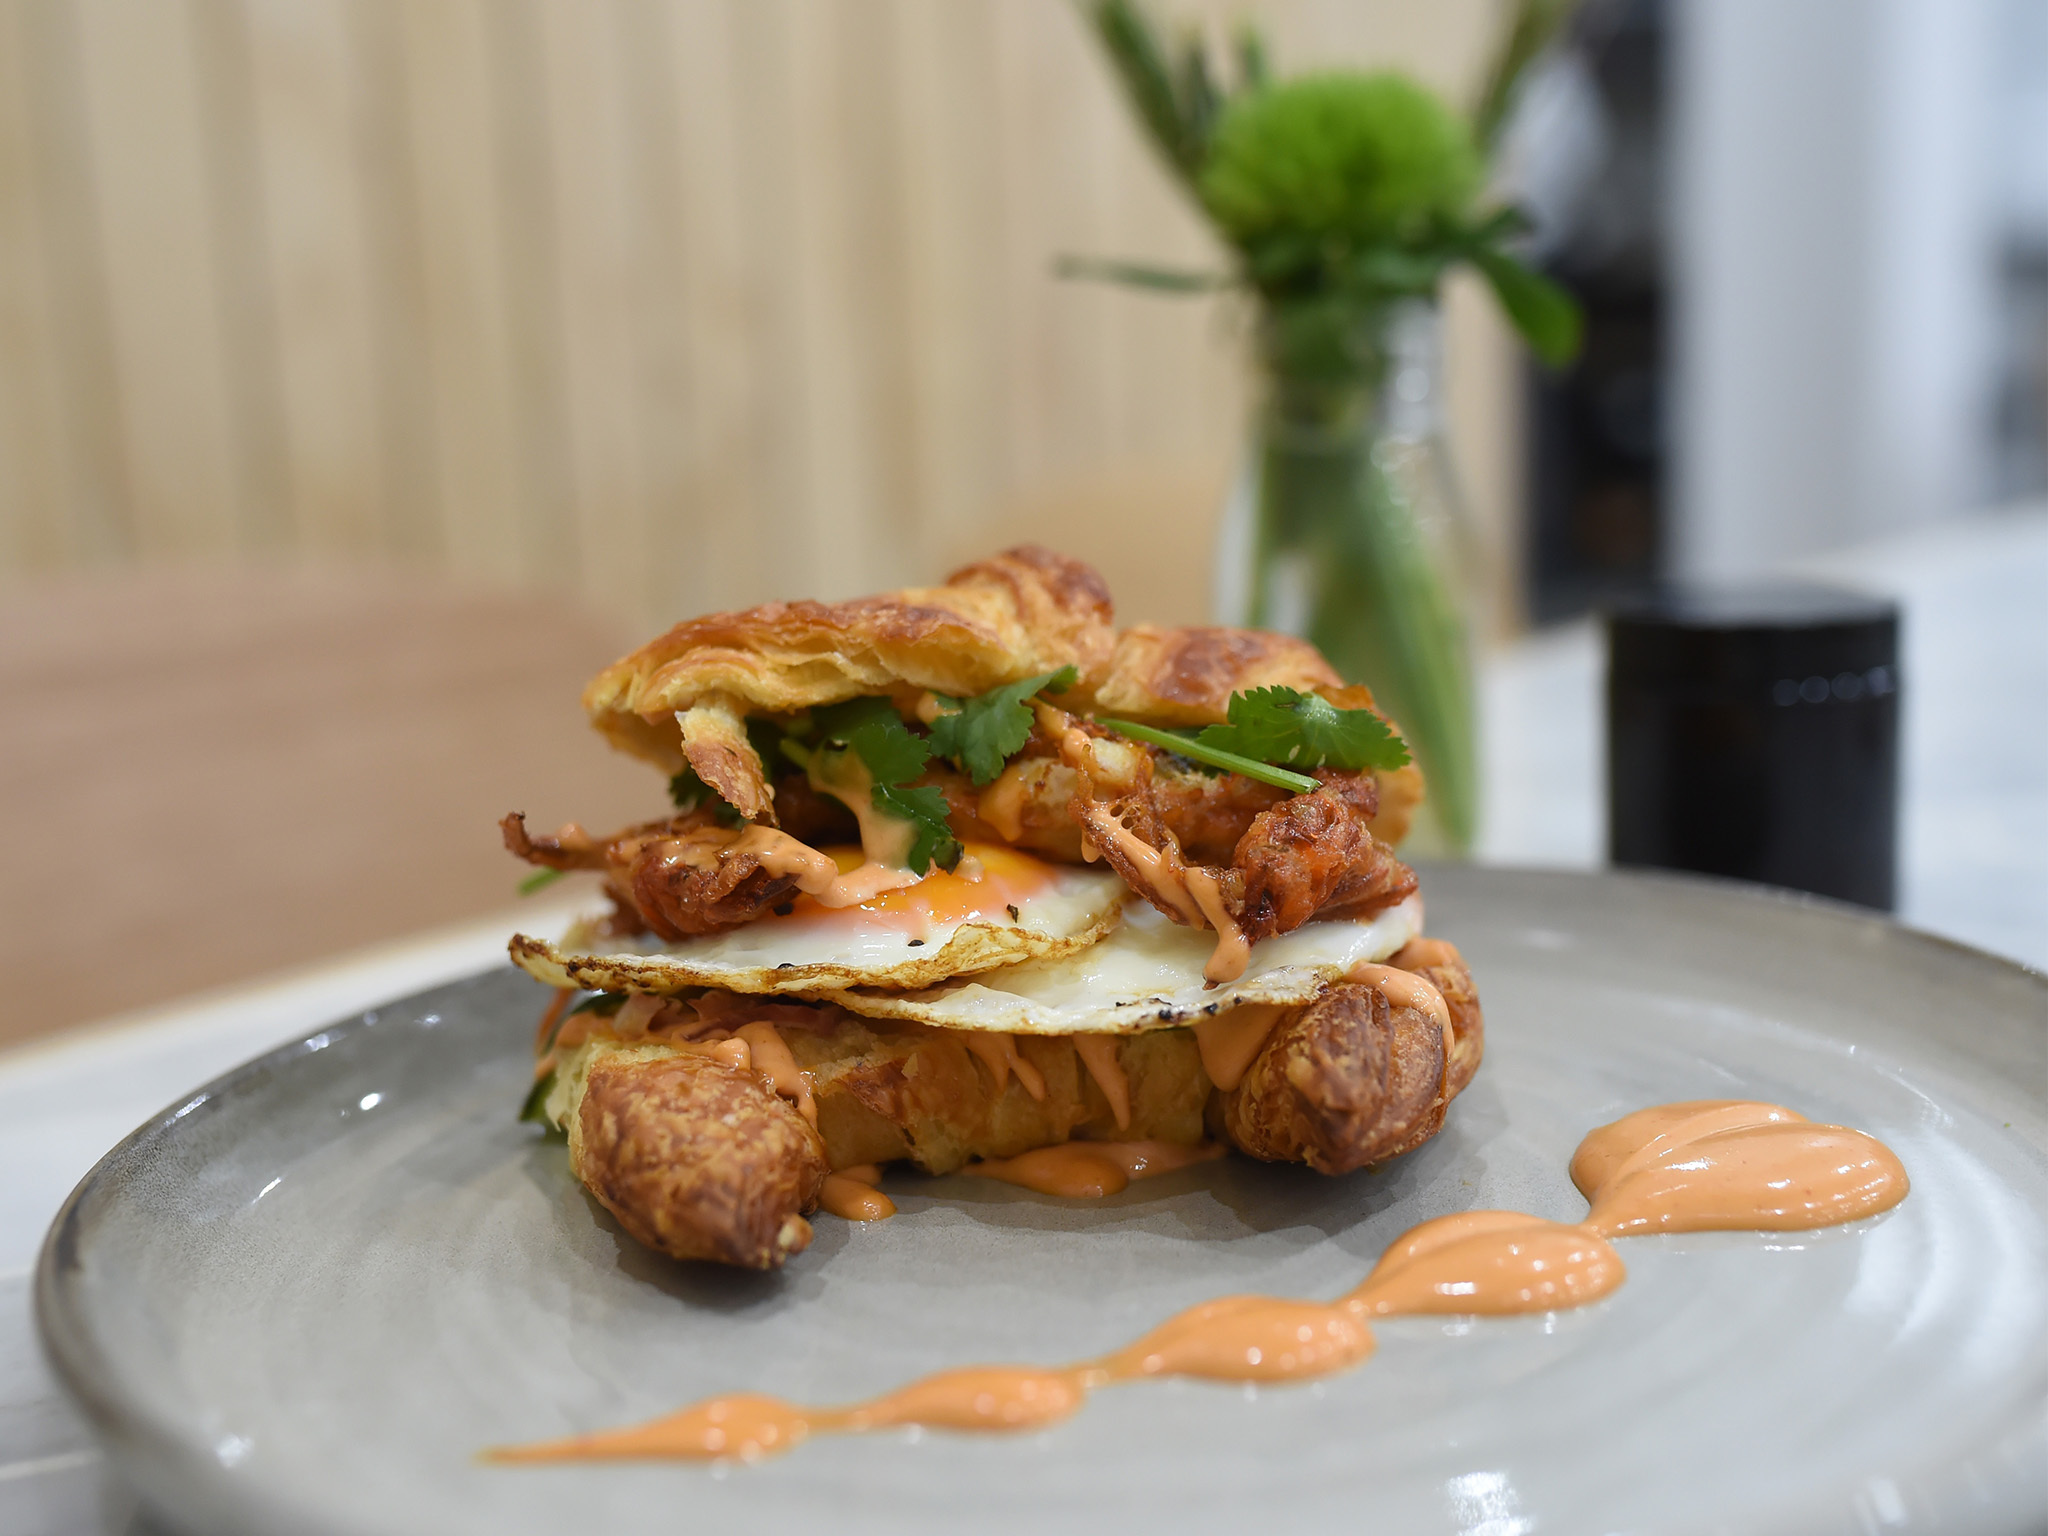 Bacon and egg croissant at White Mojo